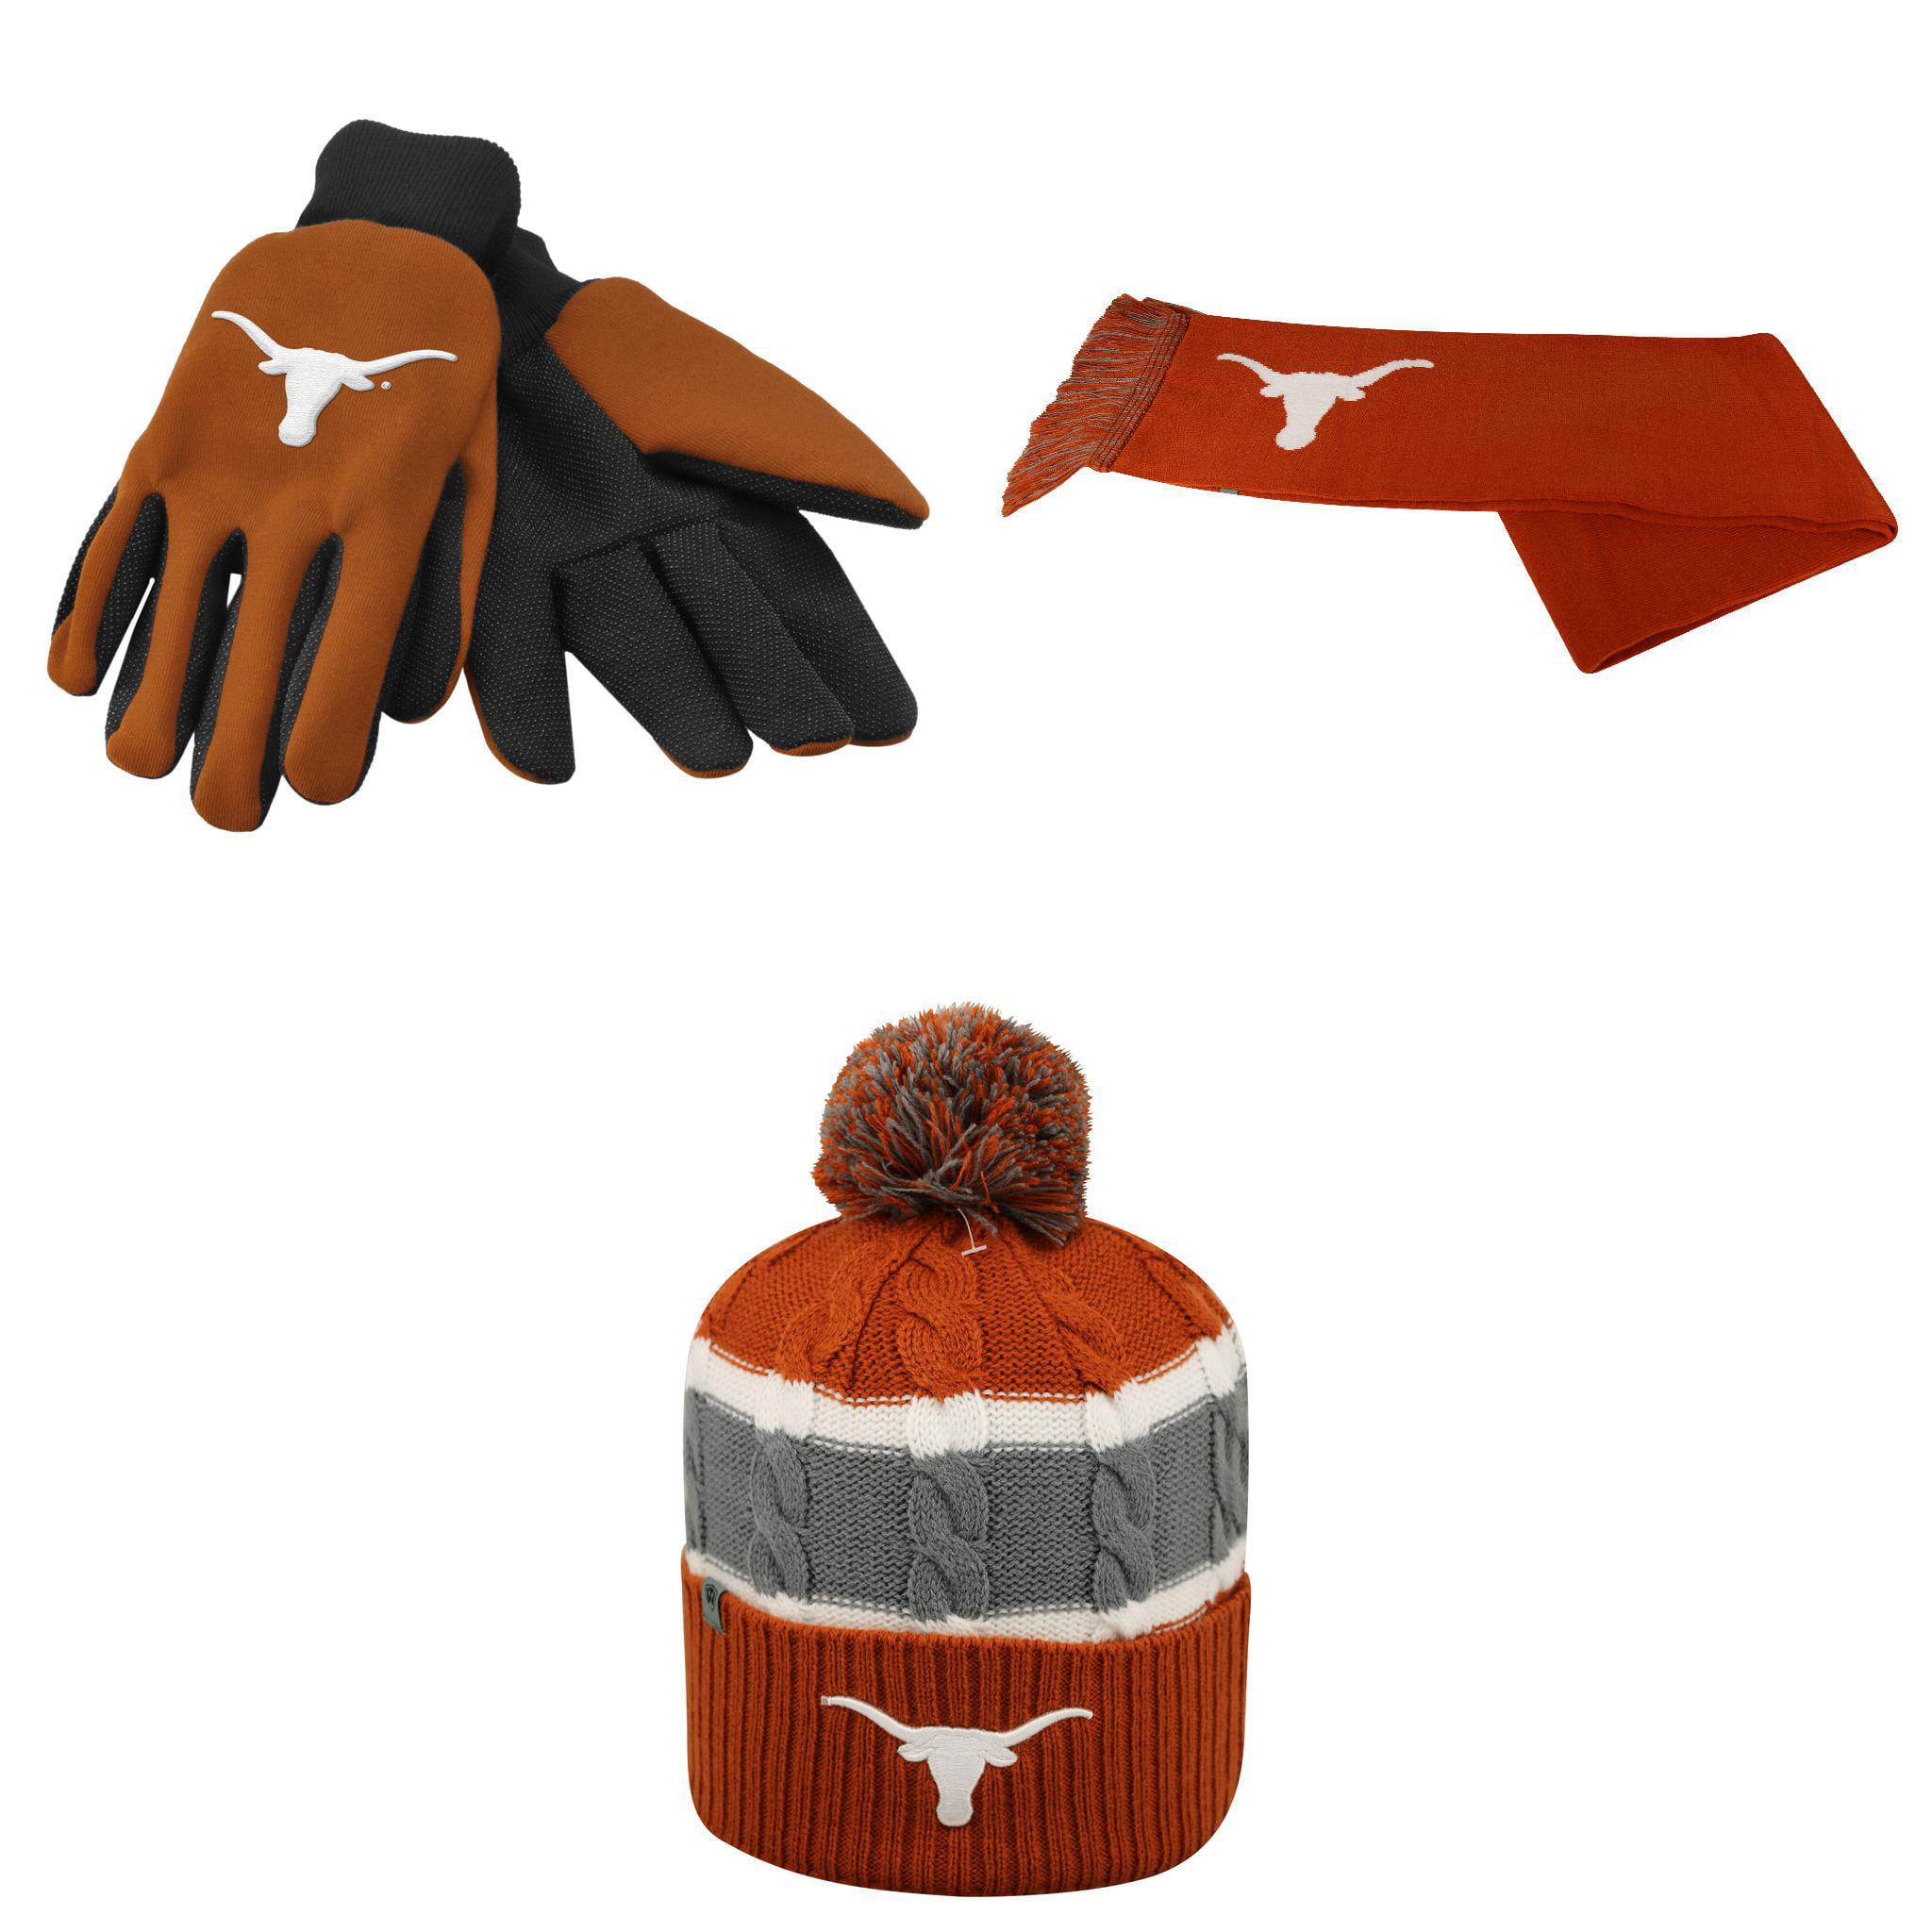 NCAA Texas Longhorns Grip Work Glove Windy Beanie Hat And Team Logo Scarf 3 Pack Bundle